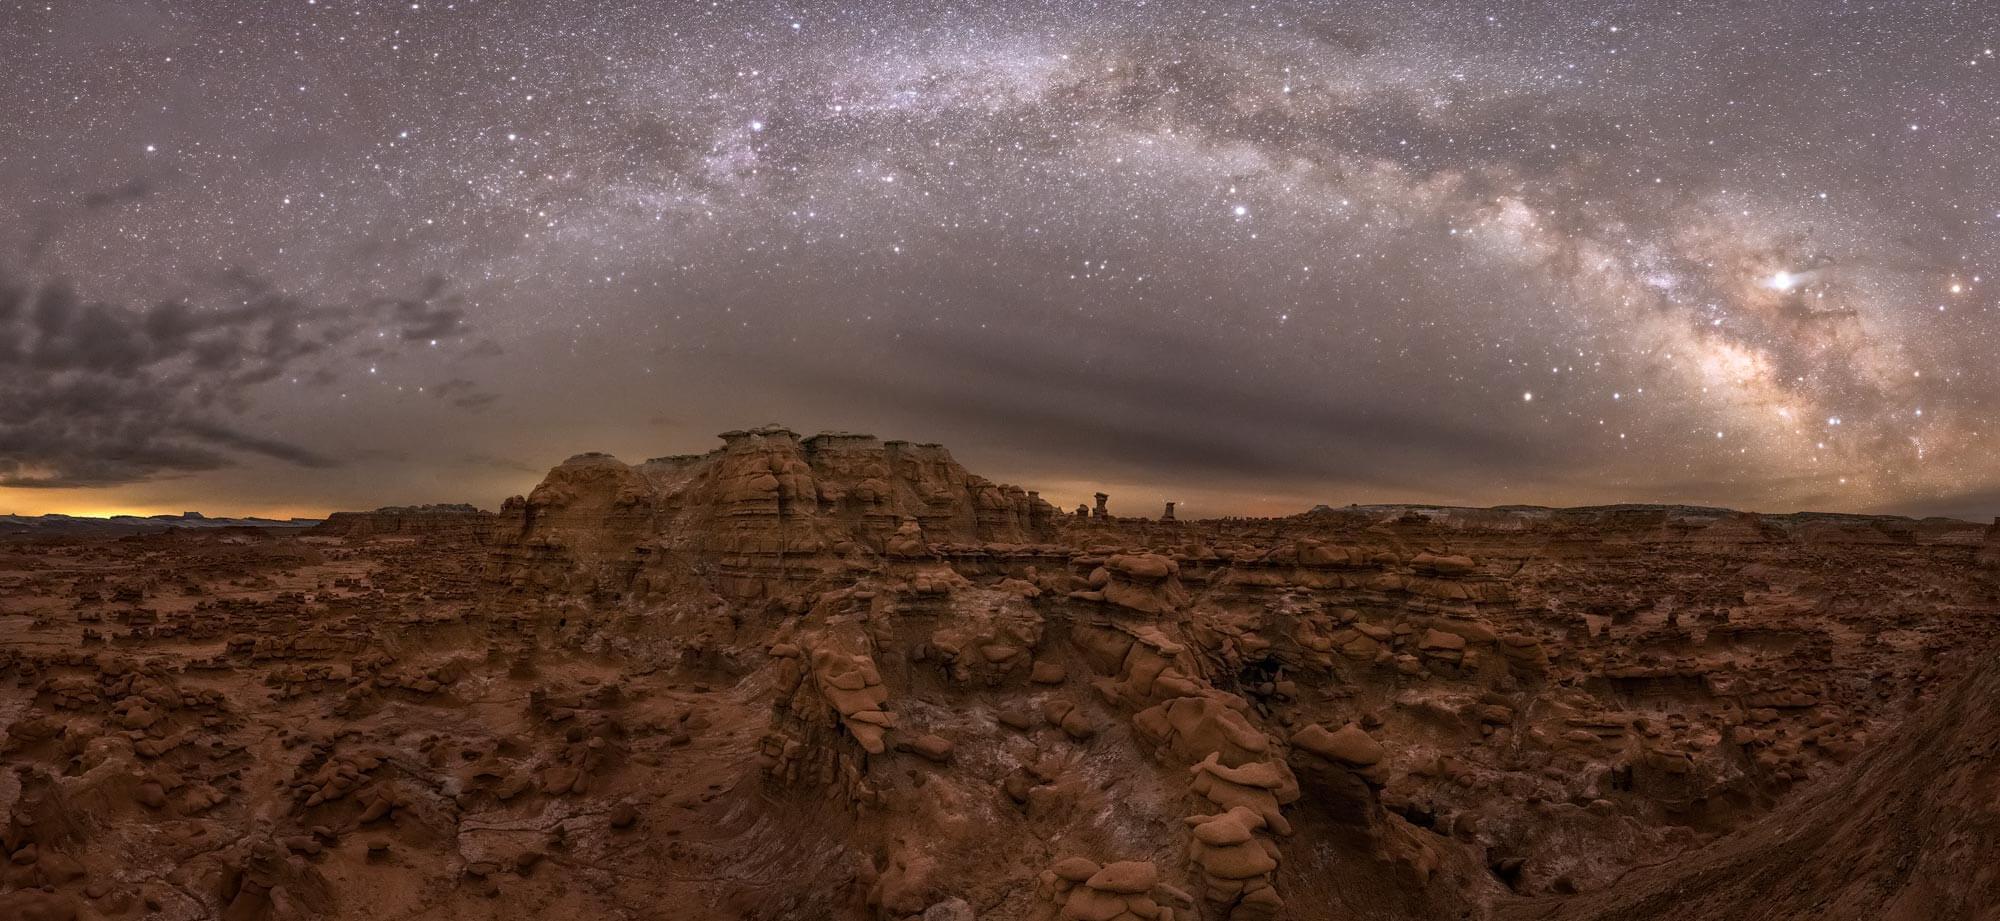 Central Utah 2020 Night Photography Workshop